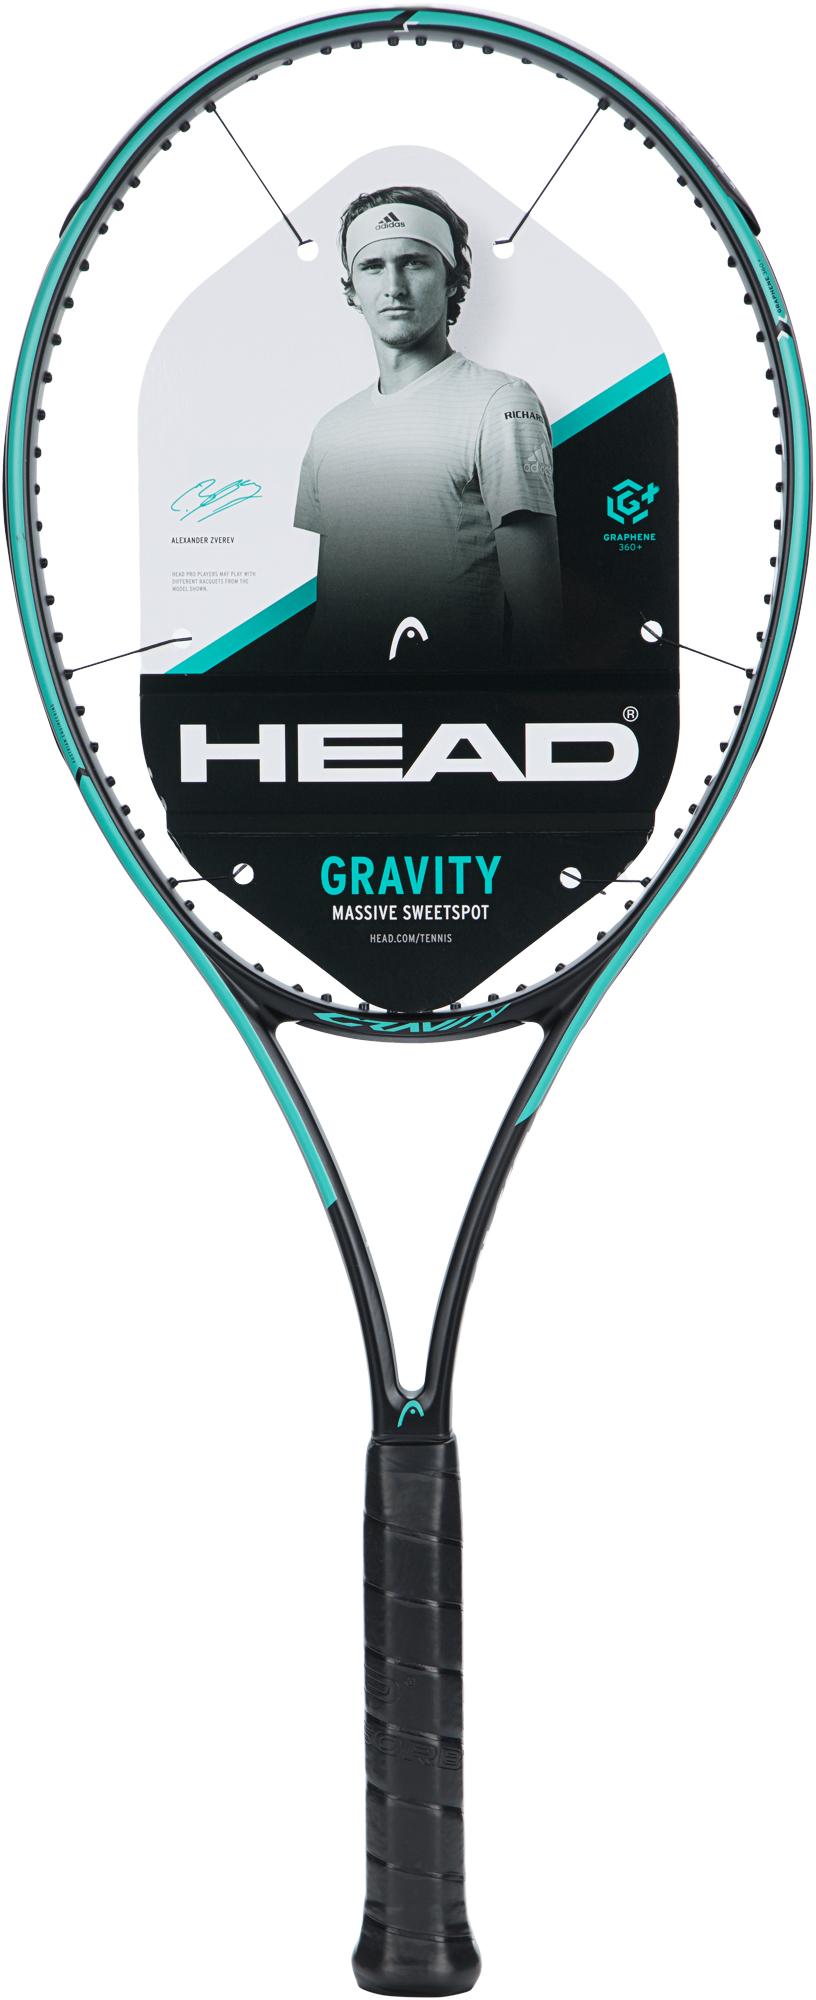 Head Ракетка для большого тенниса Head Graphene 360+ Gravity S head ракетка для большого тенниса head graphene 360 speed lite 27